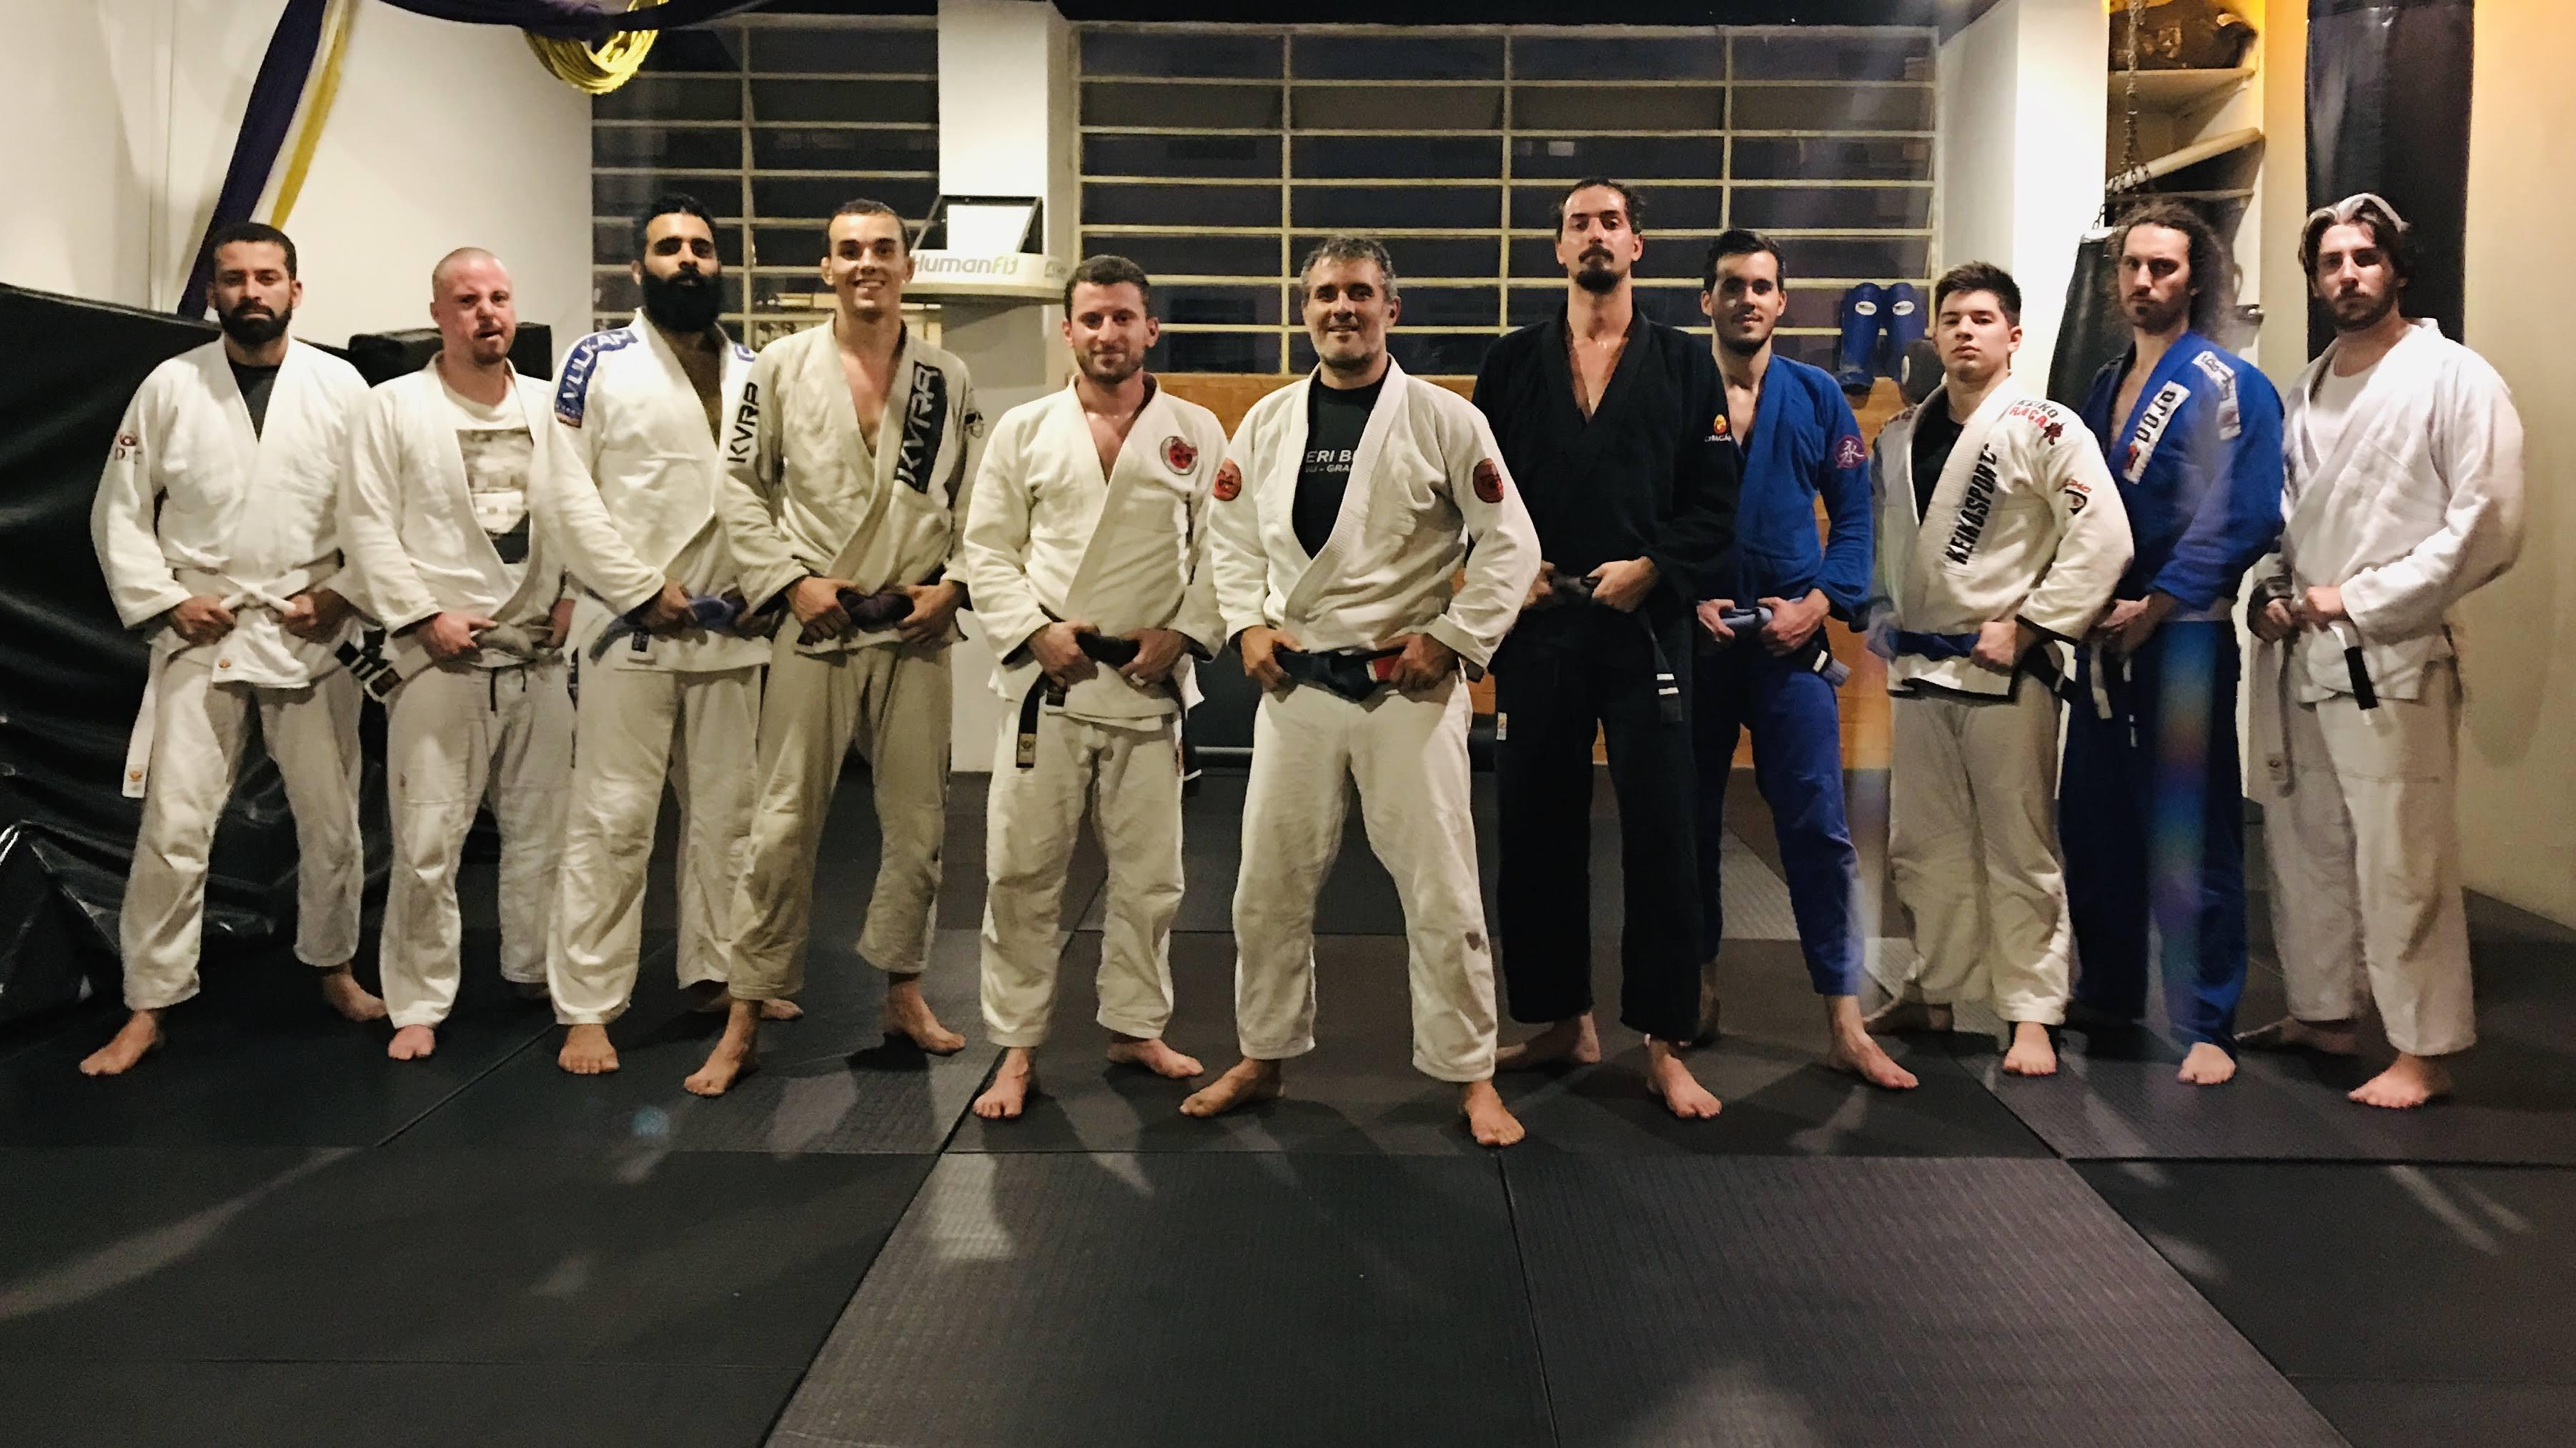 Leteri Team Jiu Jitsu Grappling